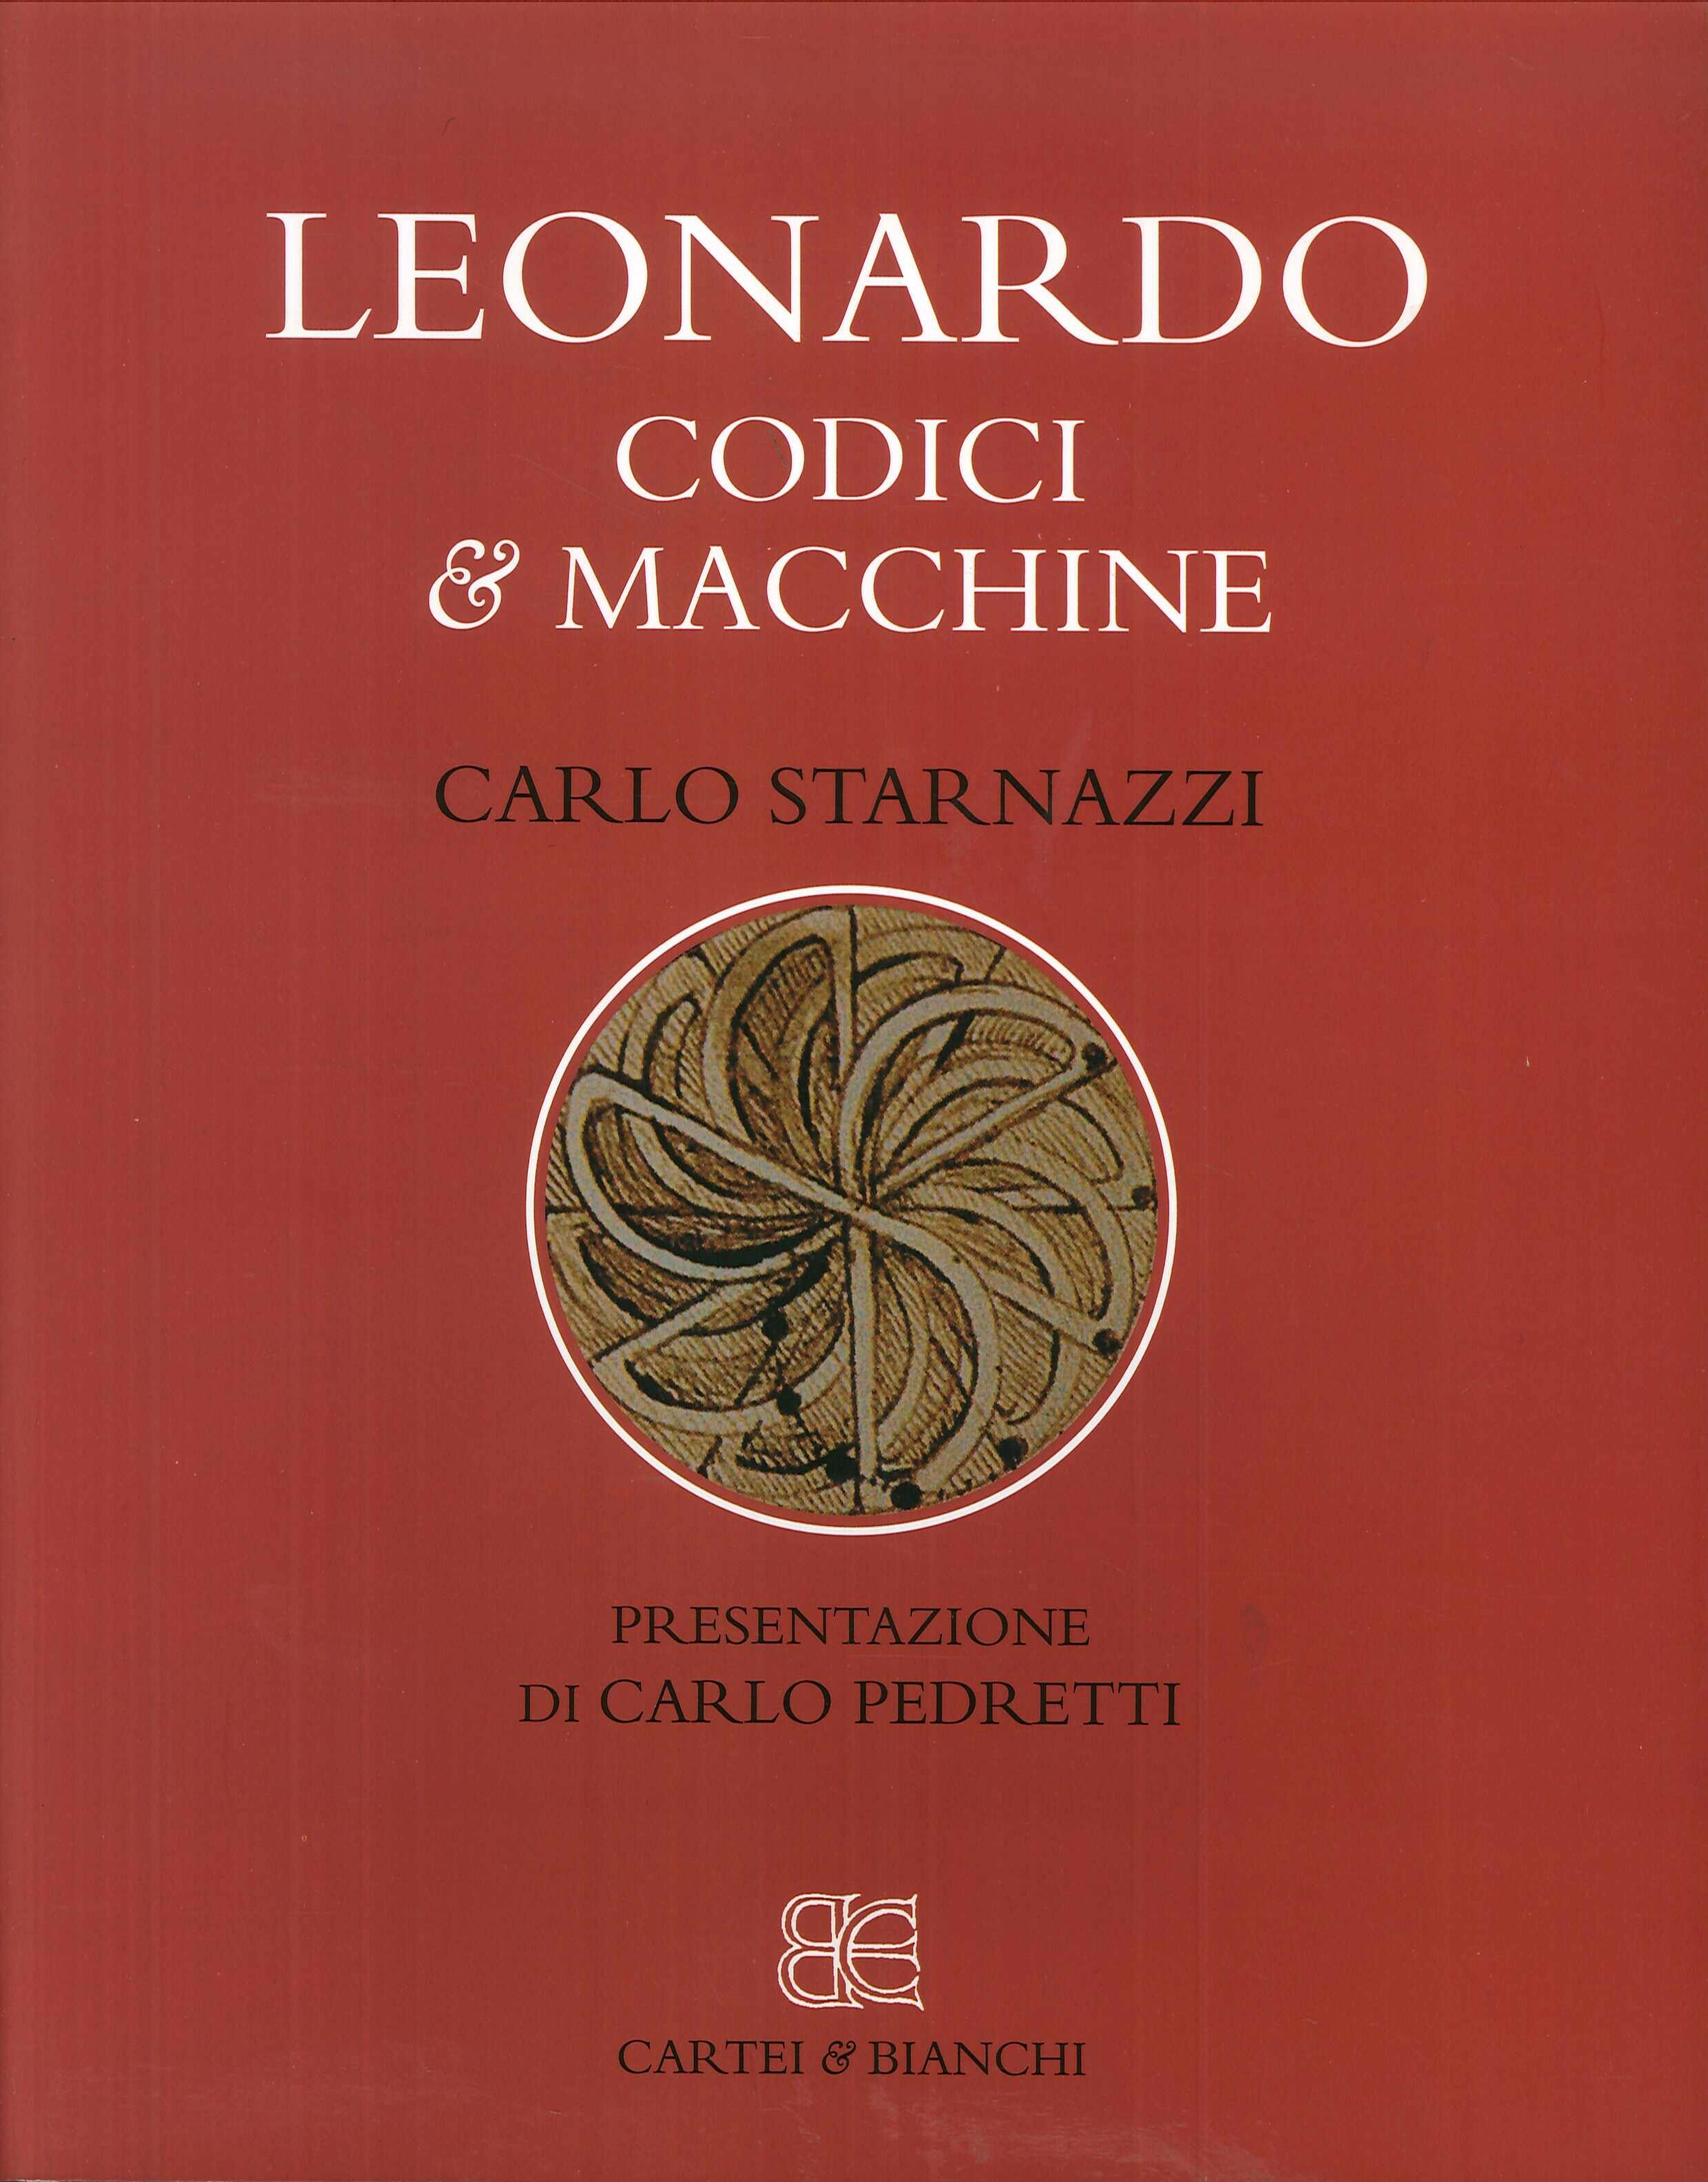 Leonardo. Codici & Macchine